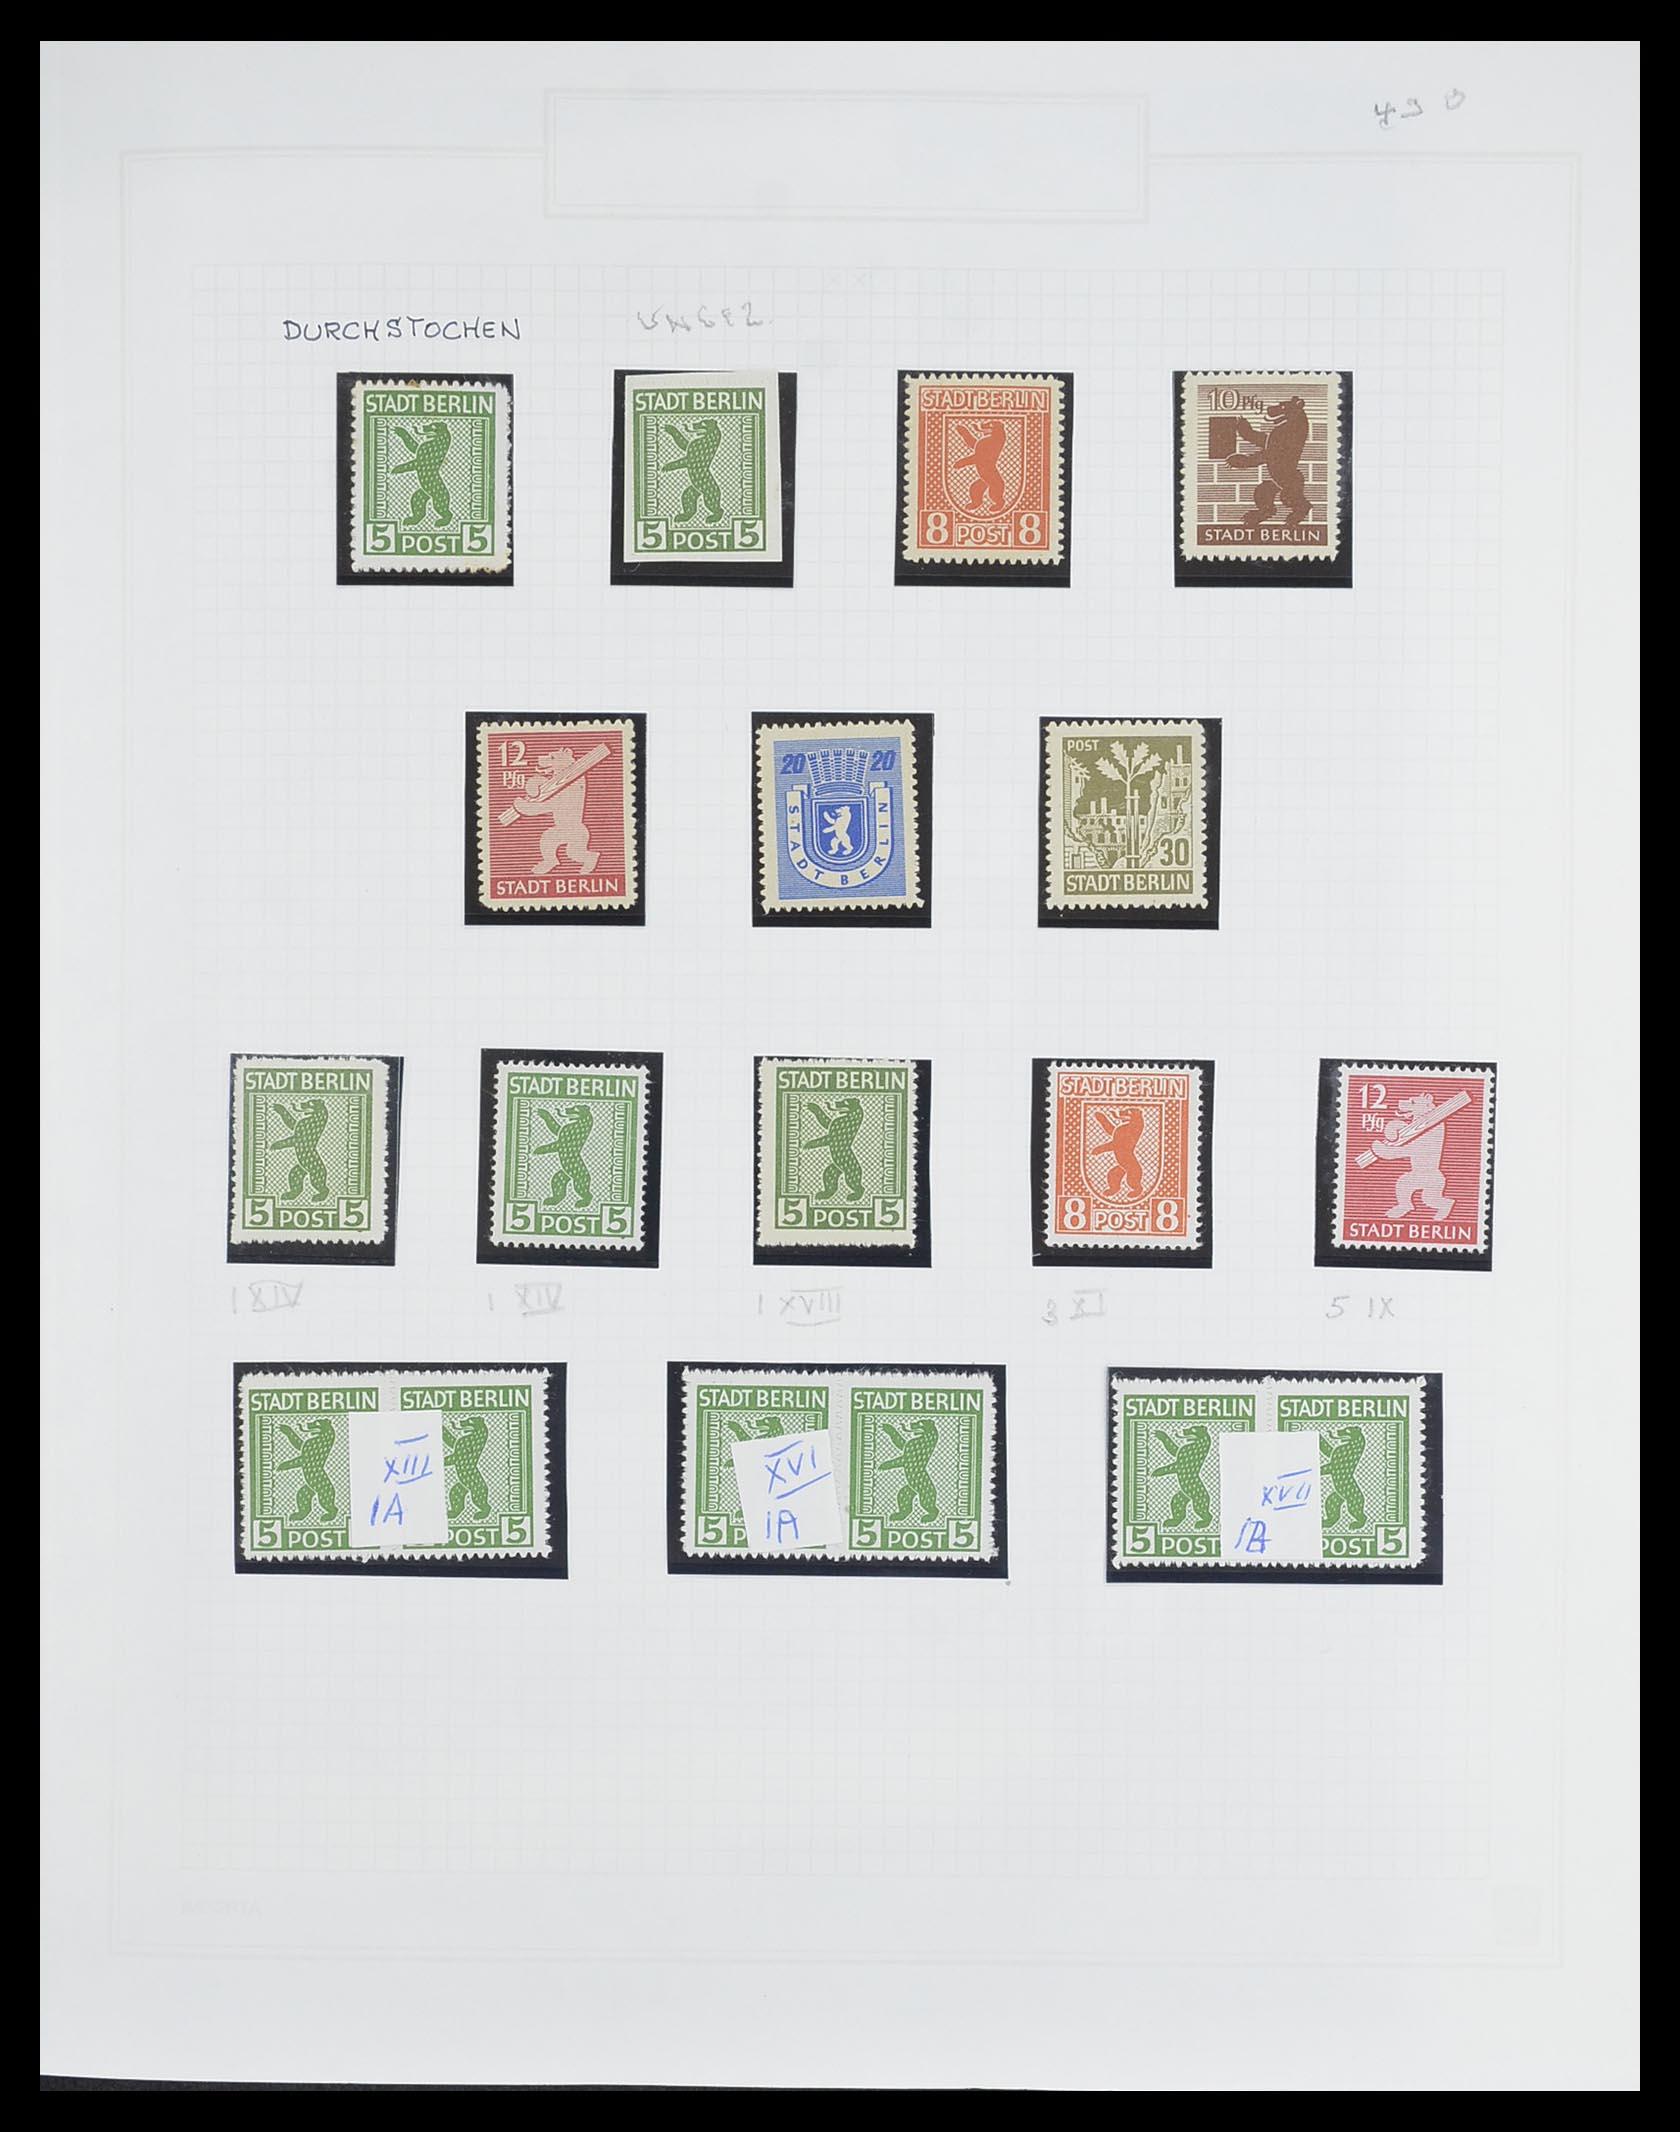 33698 002 - Postzegelverzameling 33698 Sovjet Zone 1945-1948.